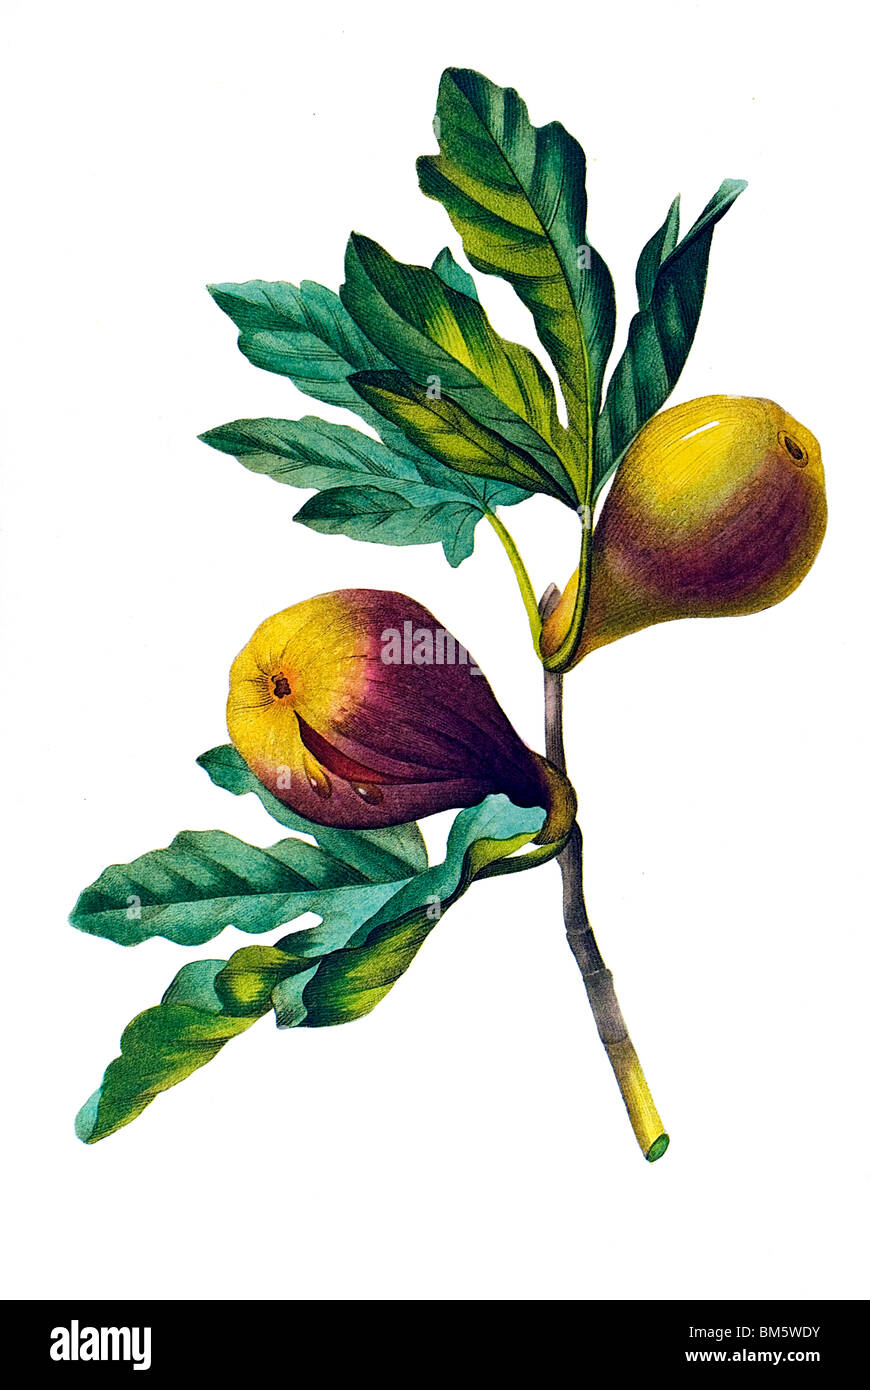 Violett fig - Stock Image